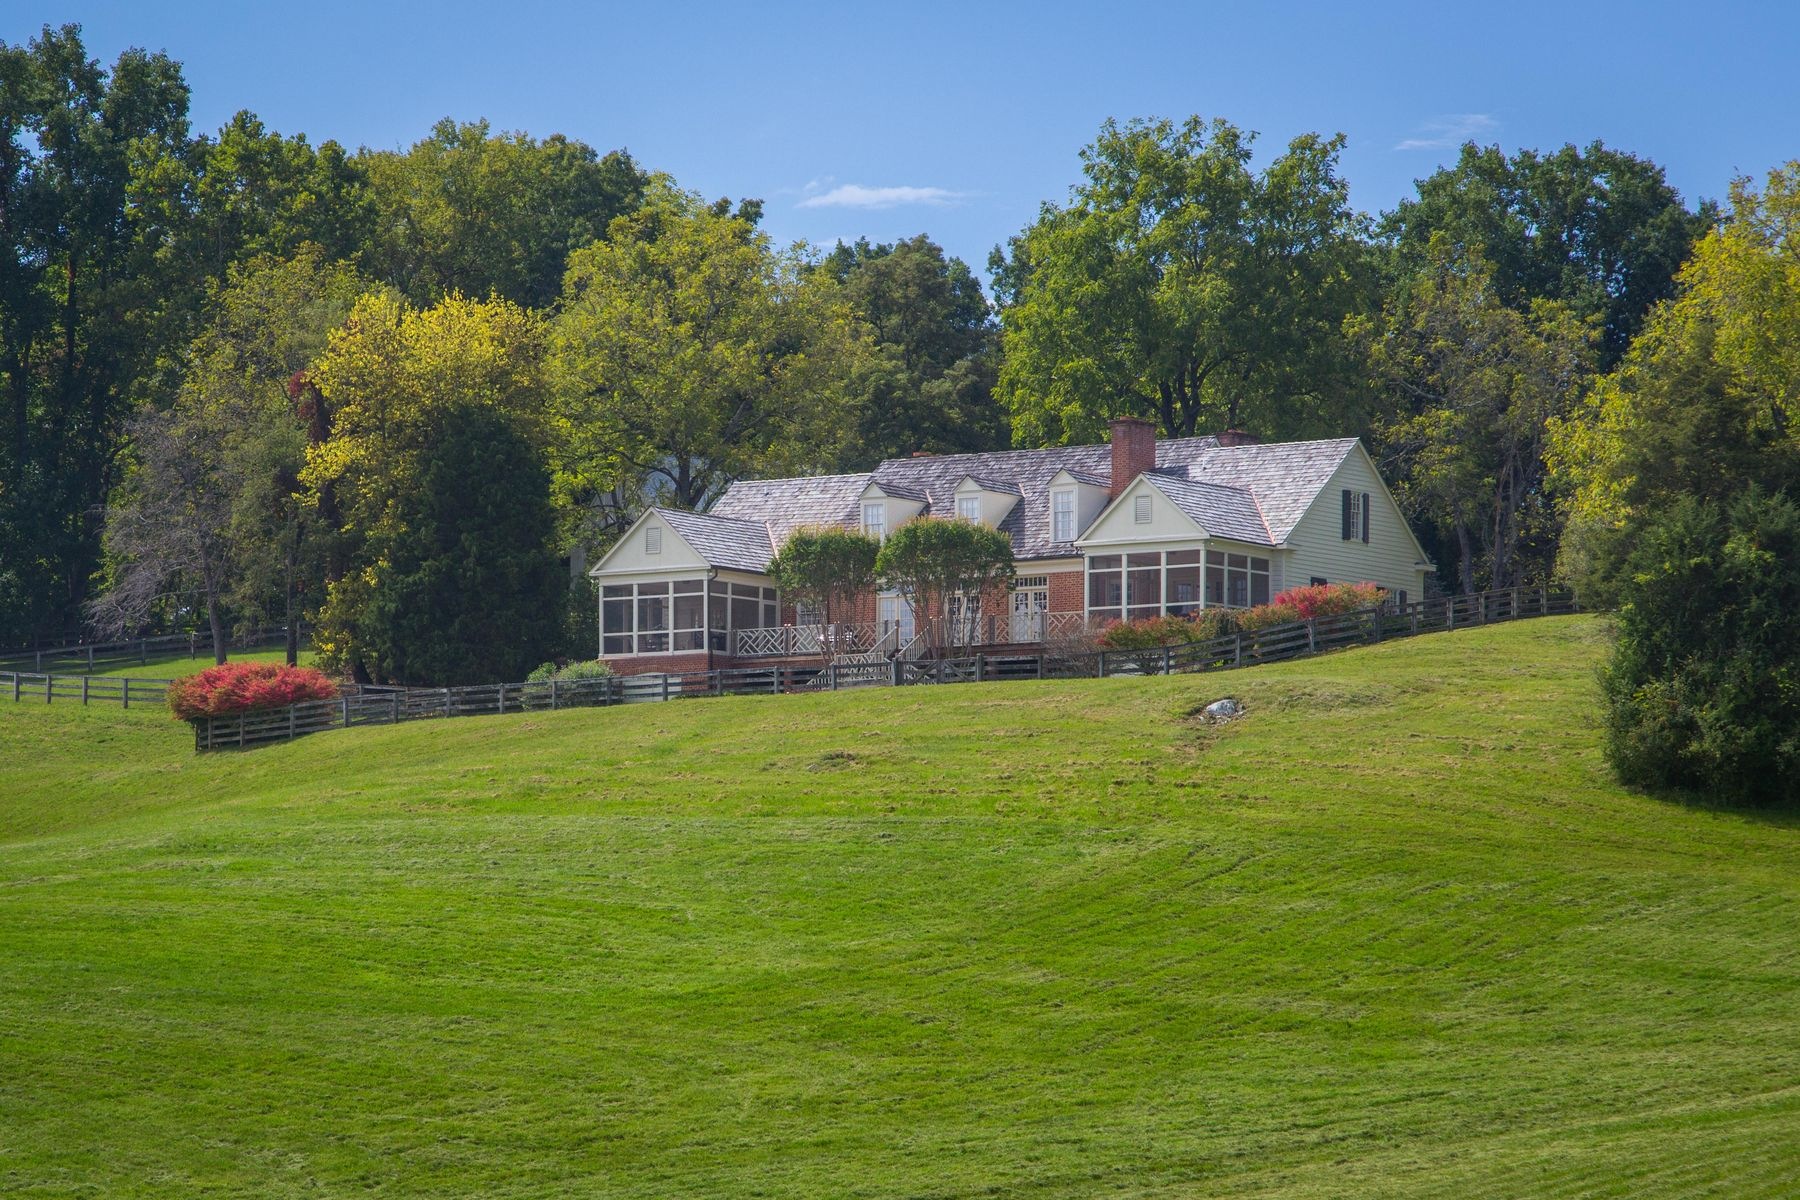 Farm / Ranch / Plantation for Sale at Stonebridge 439 BAILEYWICK LN Fincastle, Virginia 24090 United States